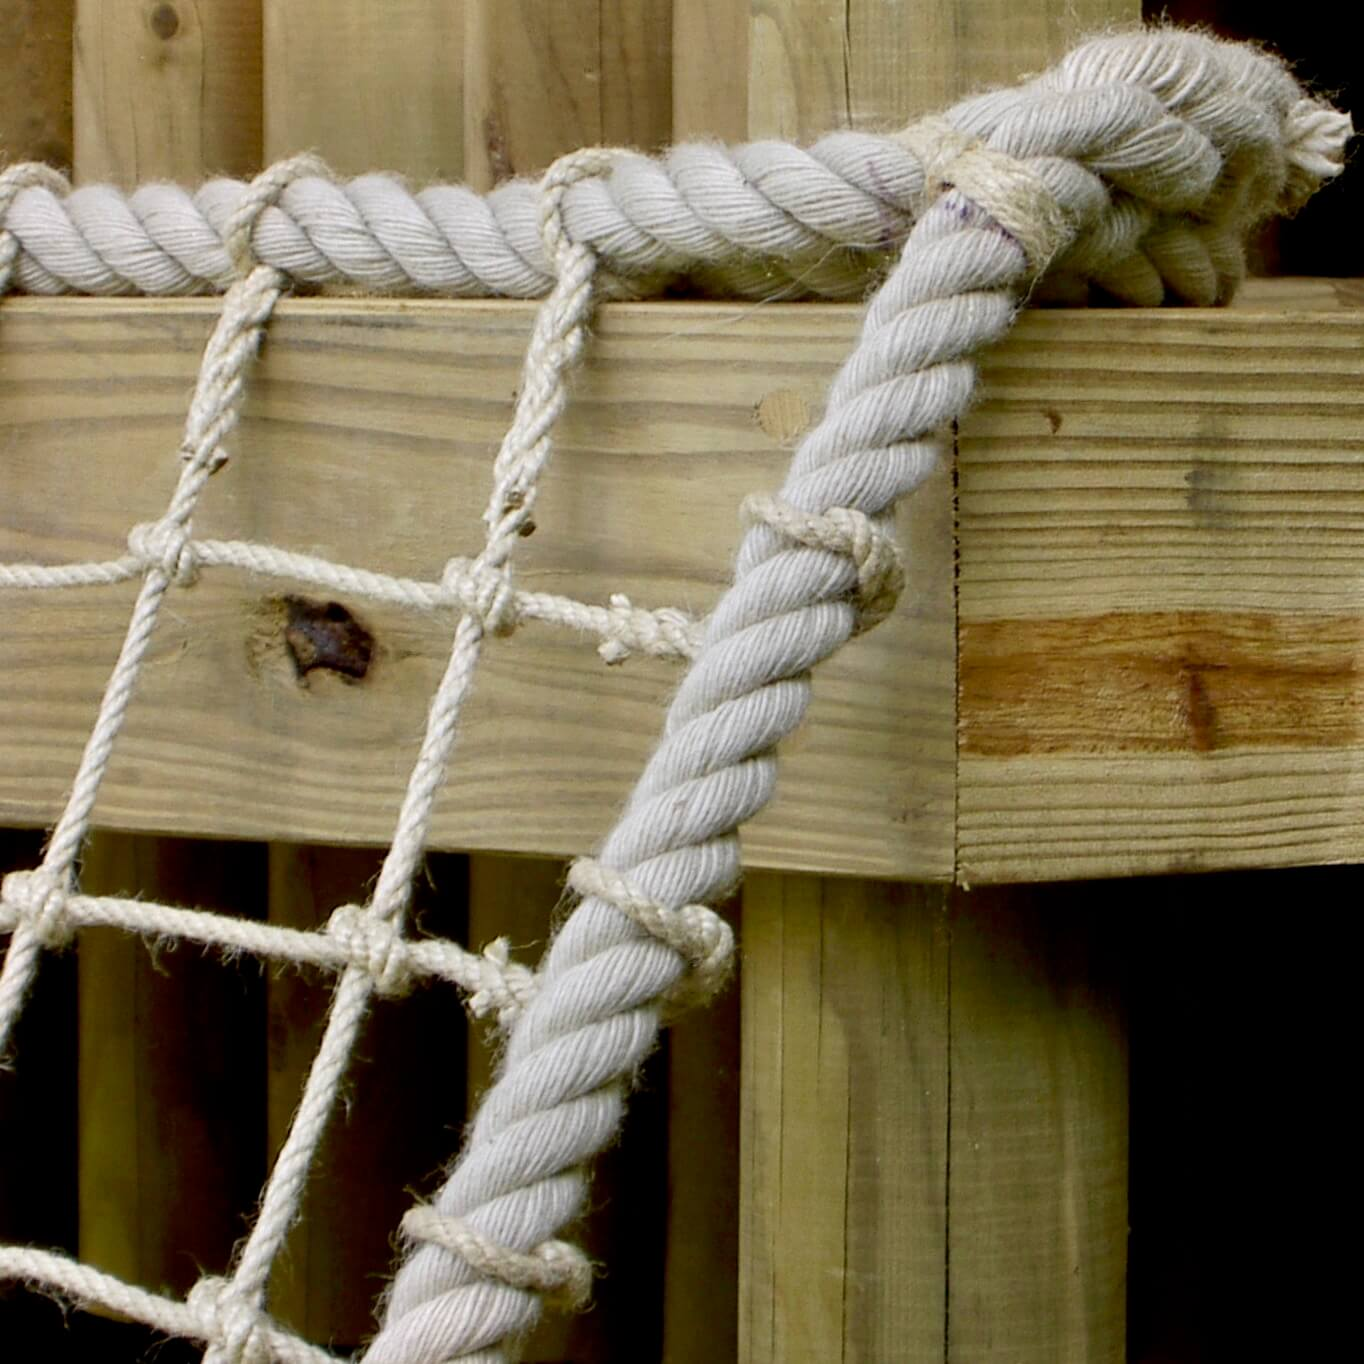 """...polyhemp kind to the hands scramble net rope"""